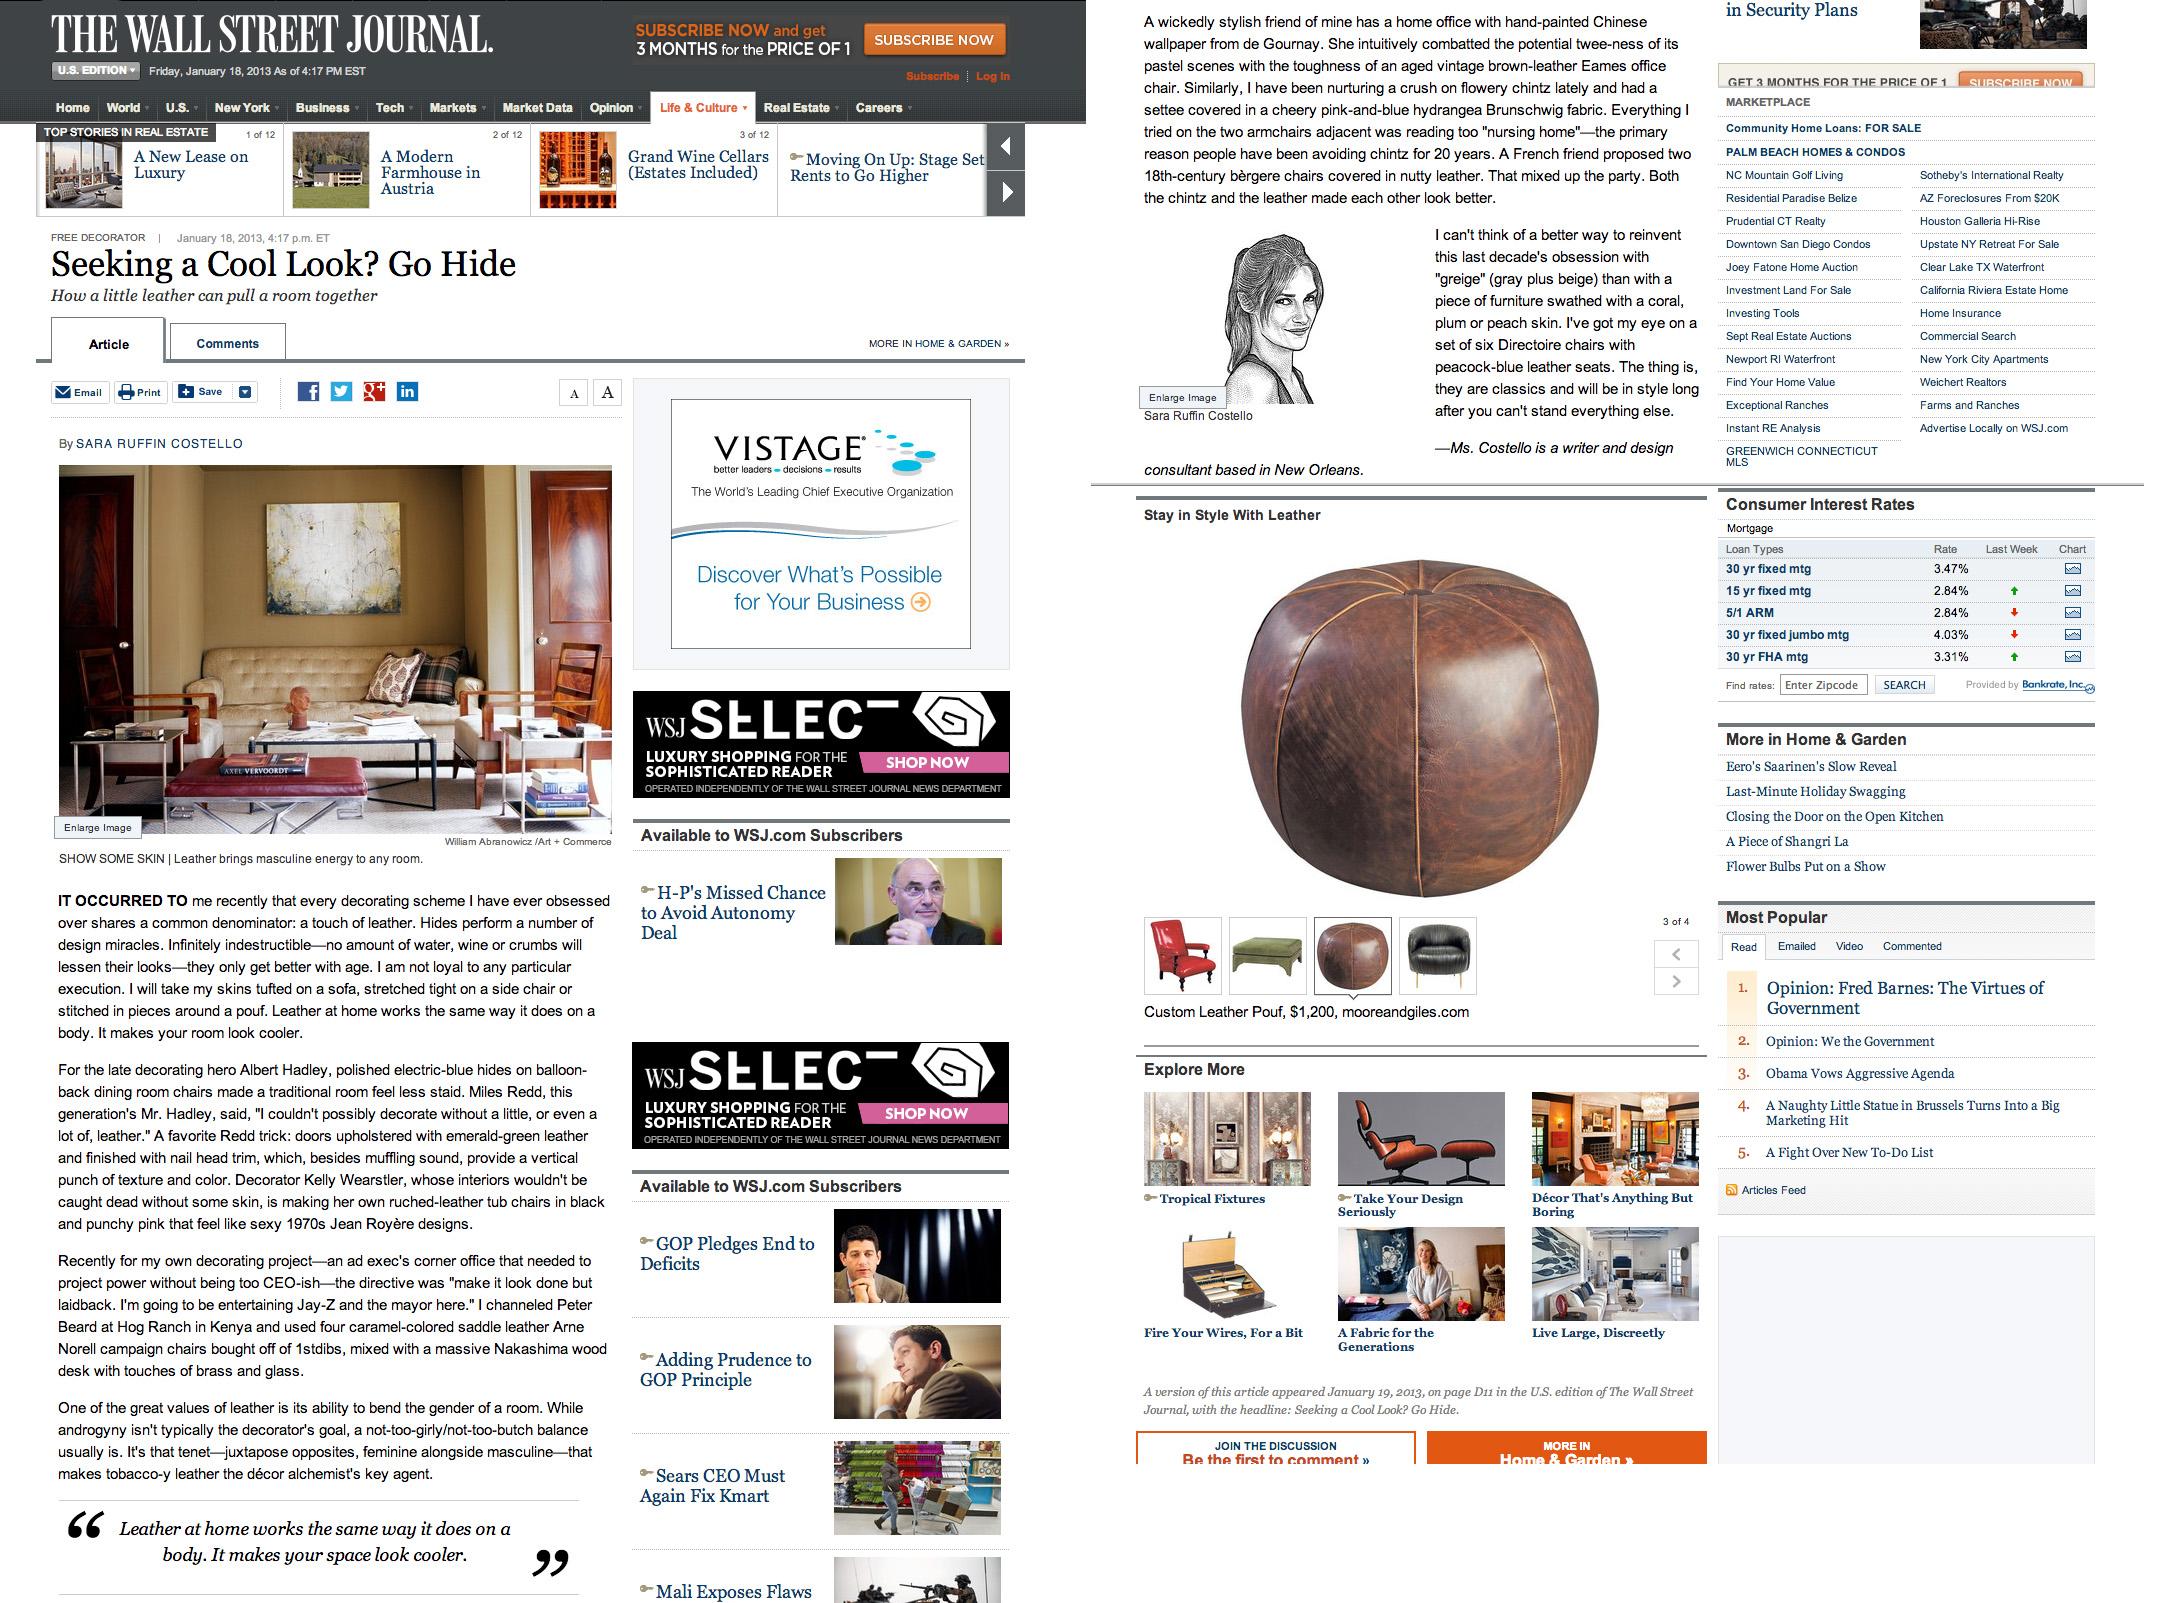 <a target='_blank' href='http://online.wsj.com/article/SB10001424127887323442804578235810407818082.html?mod=WSJ_ITP_offduty_13'>Wall Street Journal – January 2013</a>